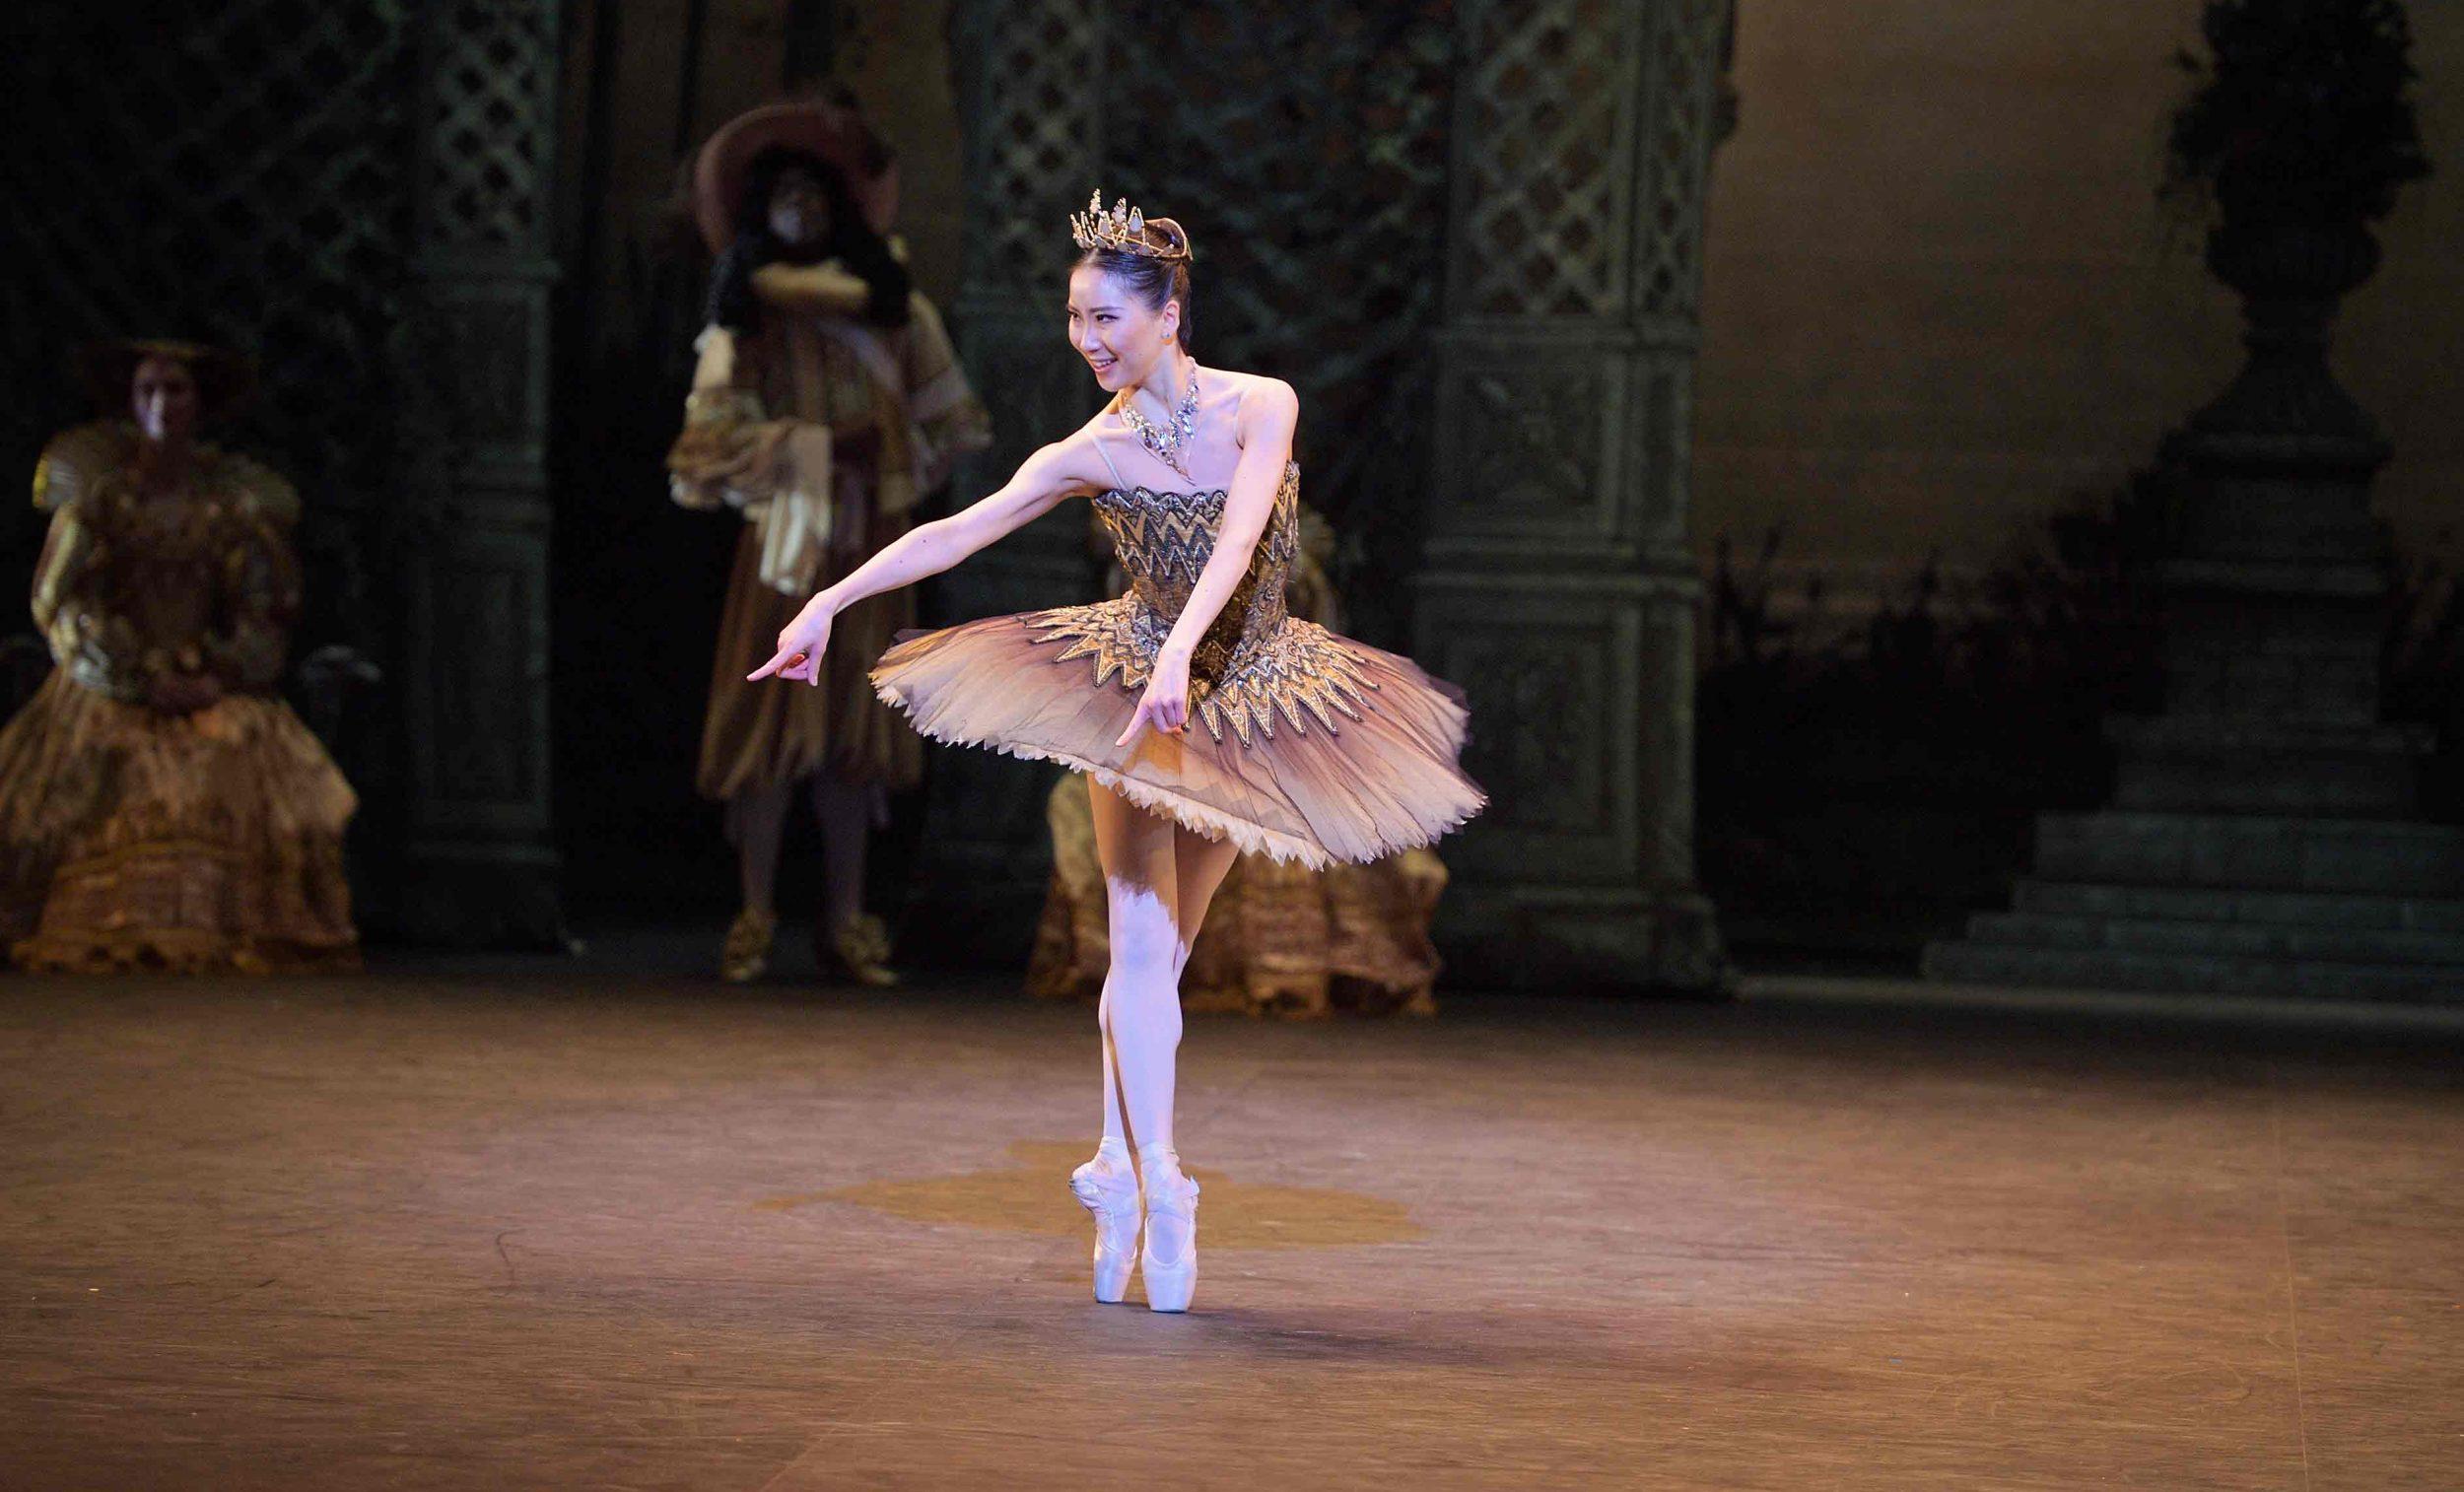 Rina-Kanehara-as-Fairy-of-the-Golden-Vine-in-The-Sleeping-Beauty-©--Laurent-Liotardo-(1)_WEB